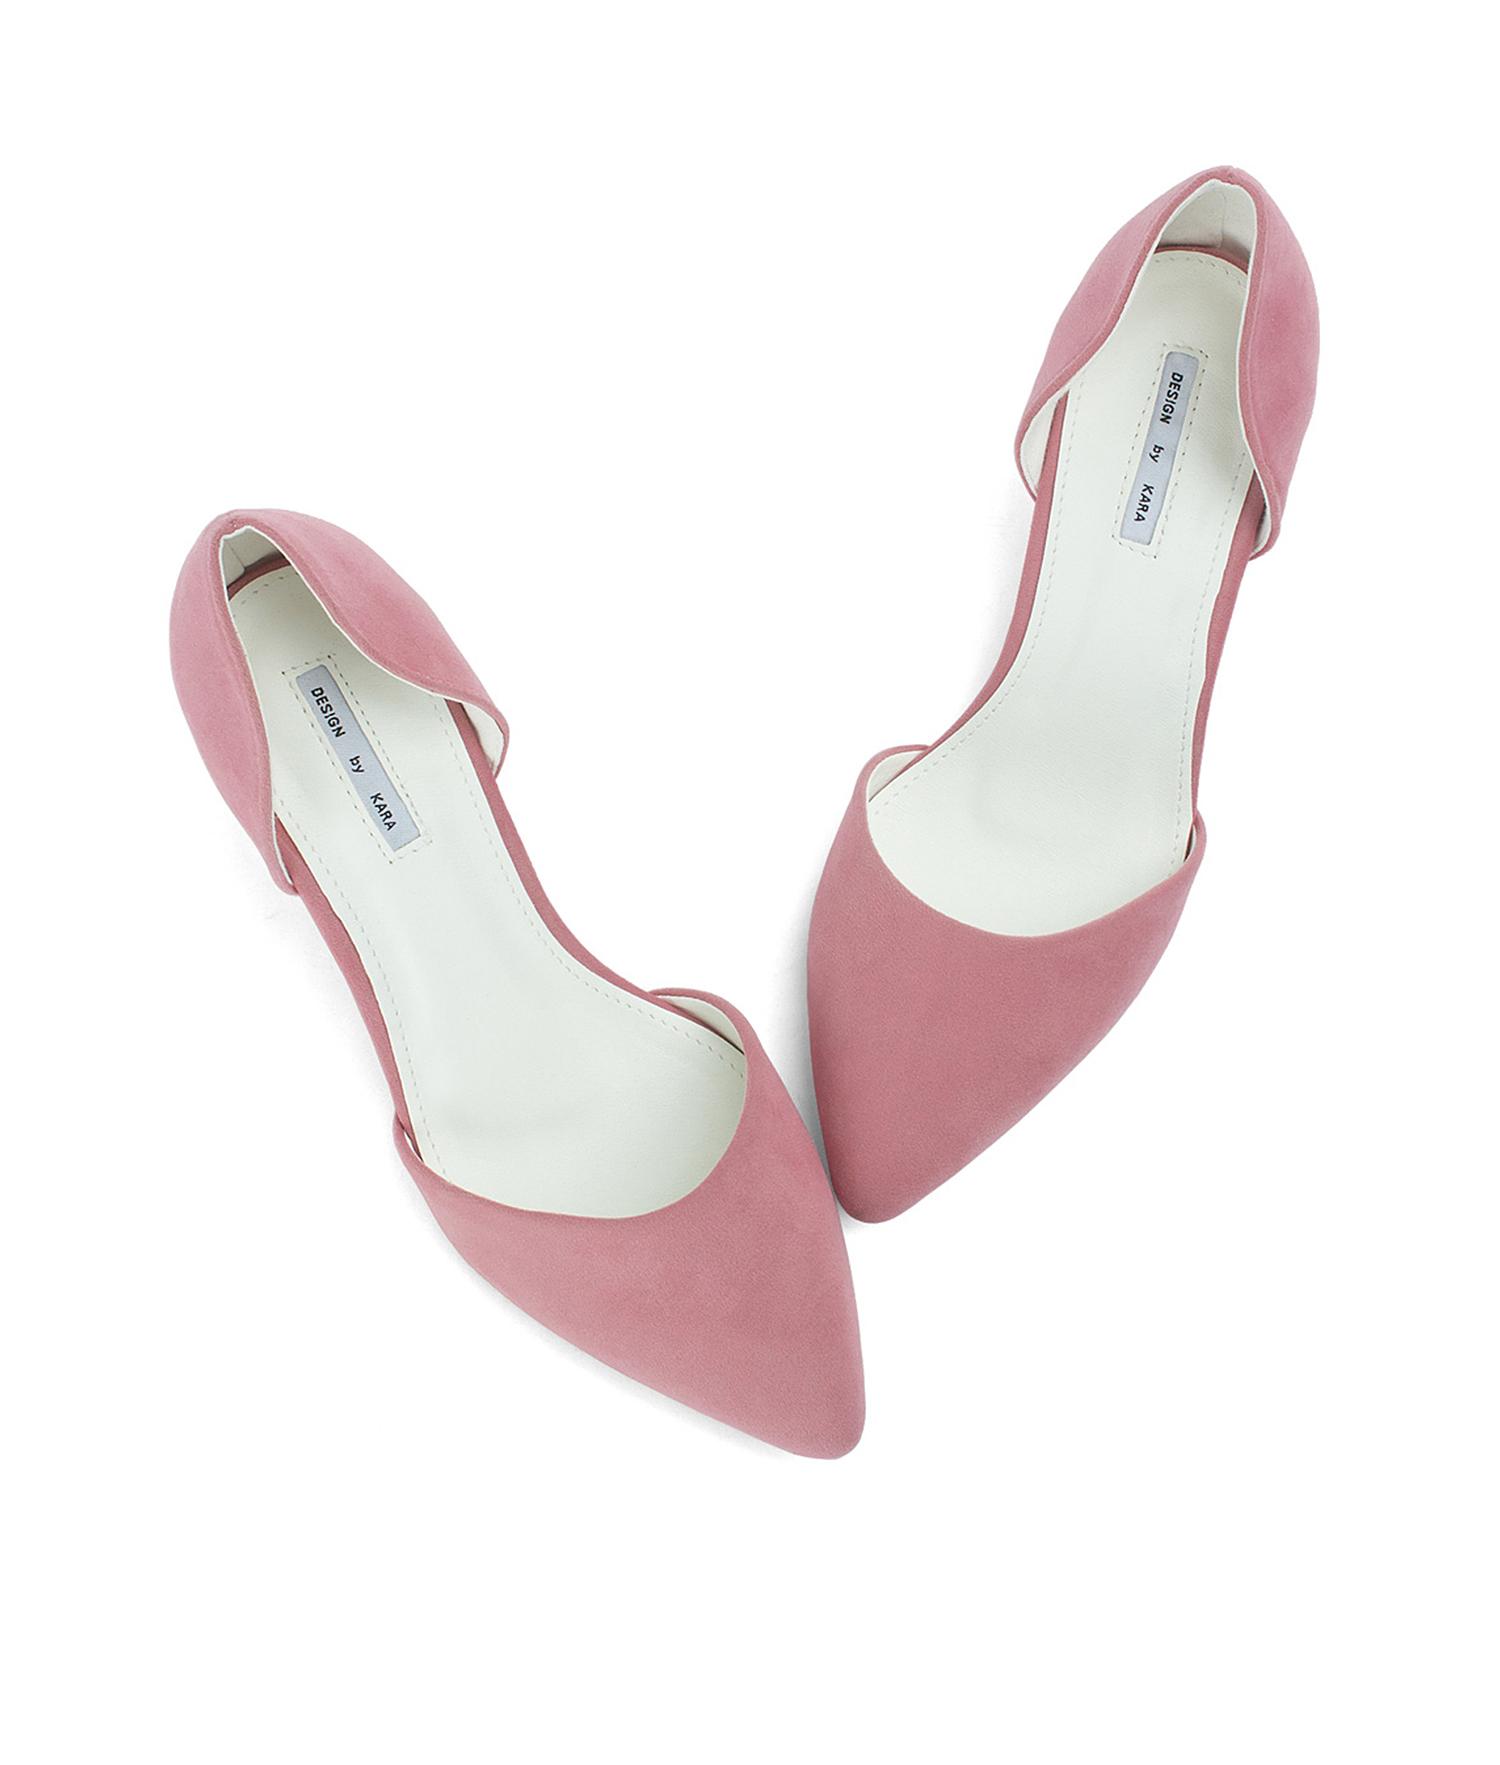 0db0186505f8 AnnaKastle Womens Faux Suede d Orsay Kitten Heels PinkSherbet